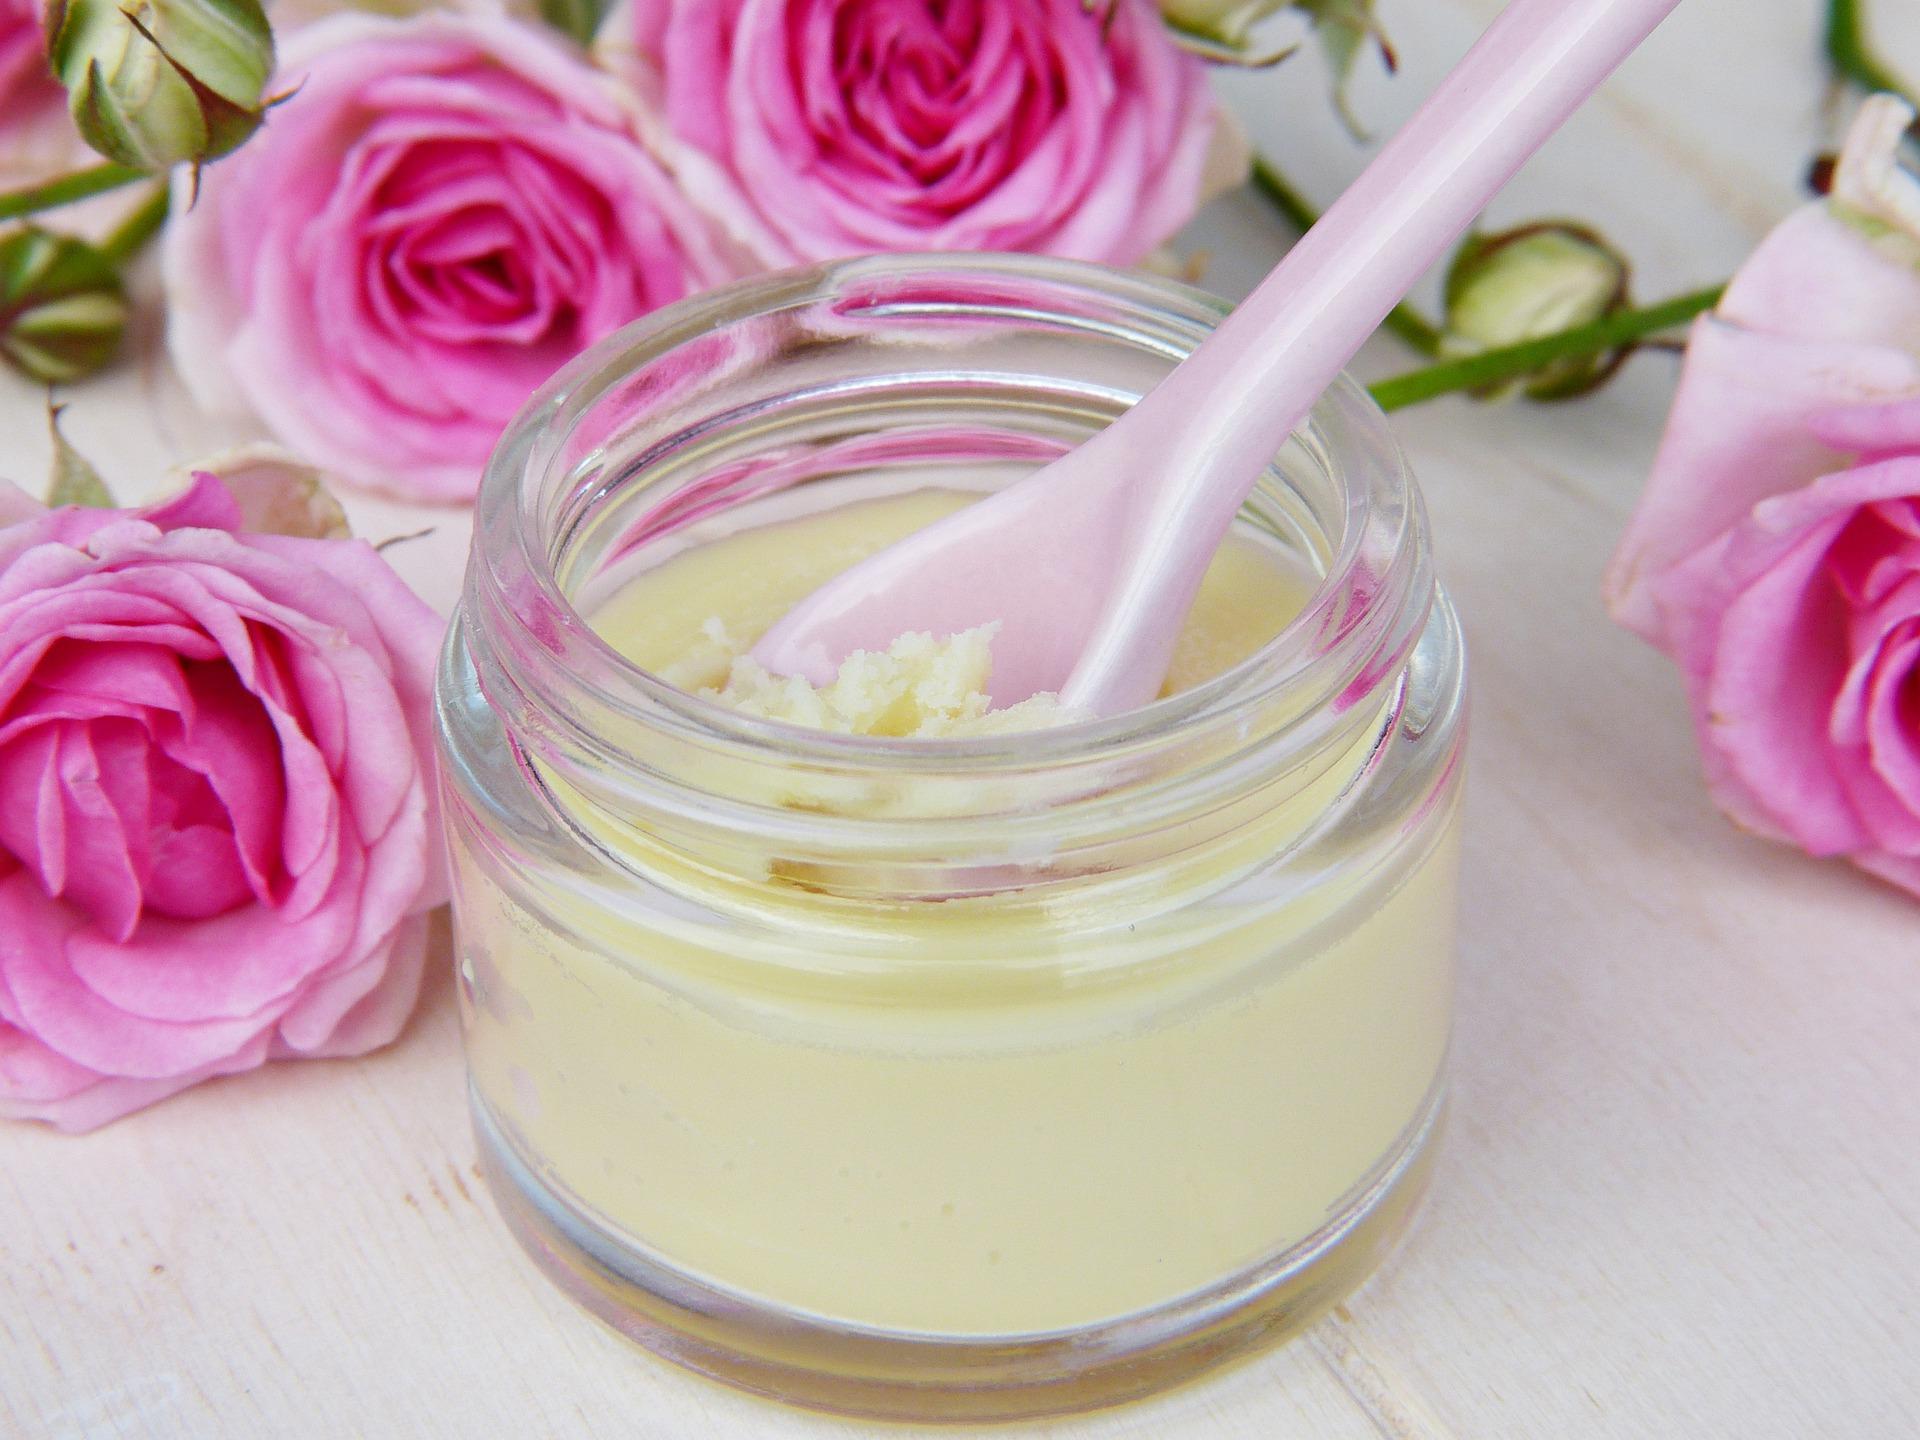 ulei de cocos frumusete - sfatulparintilor.ro - pixabay_com - glass-3141865_1920